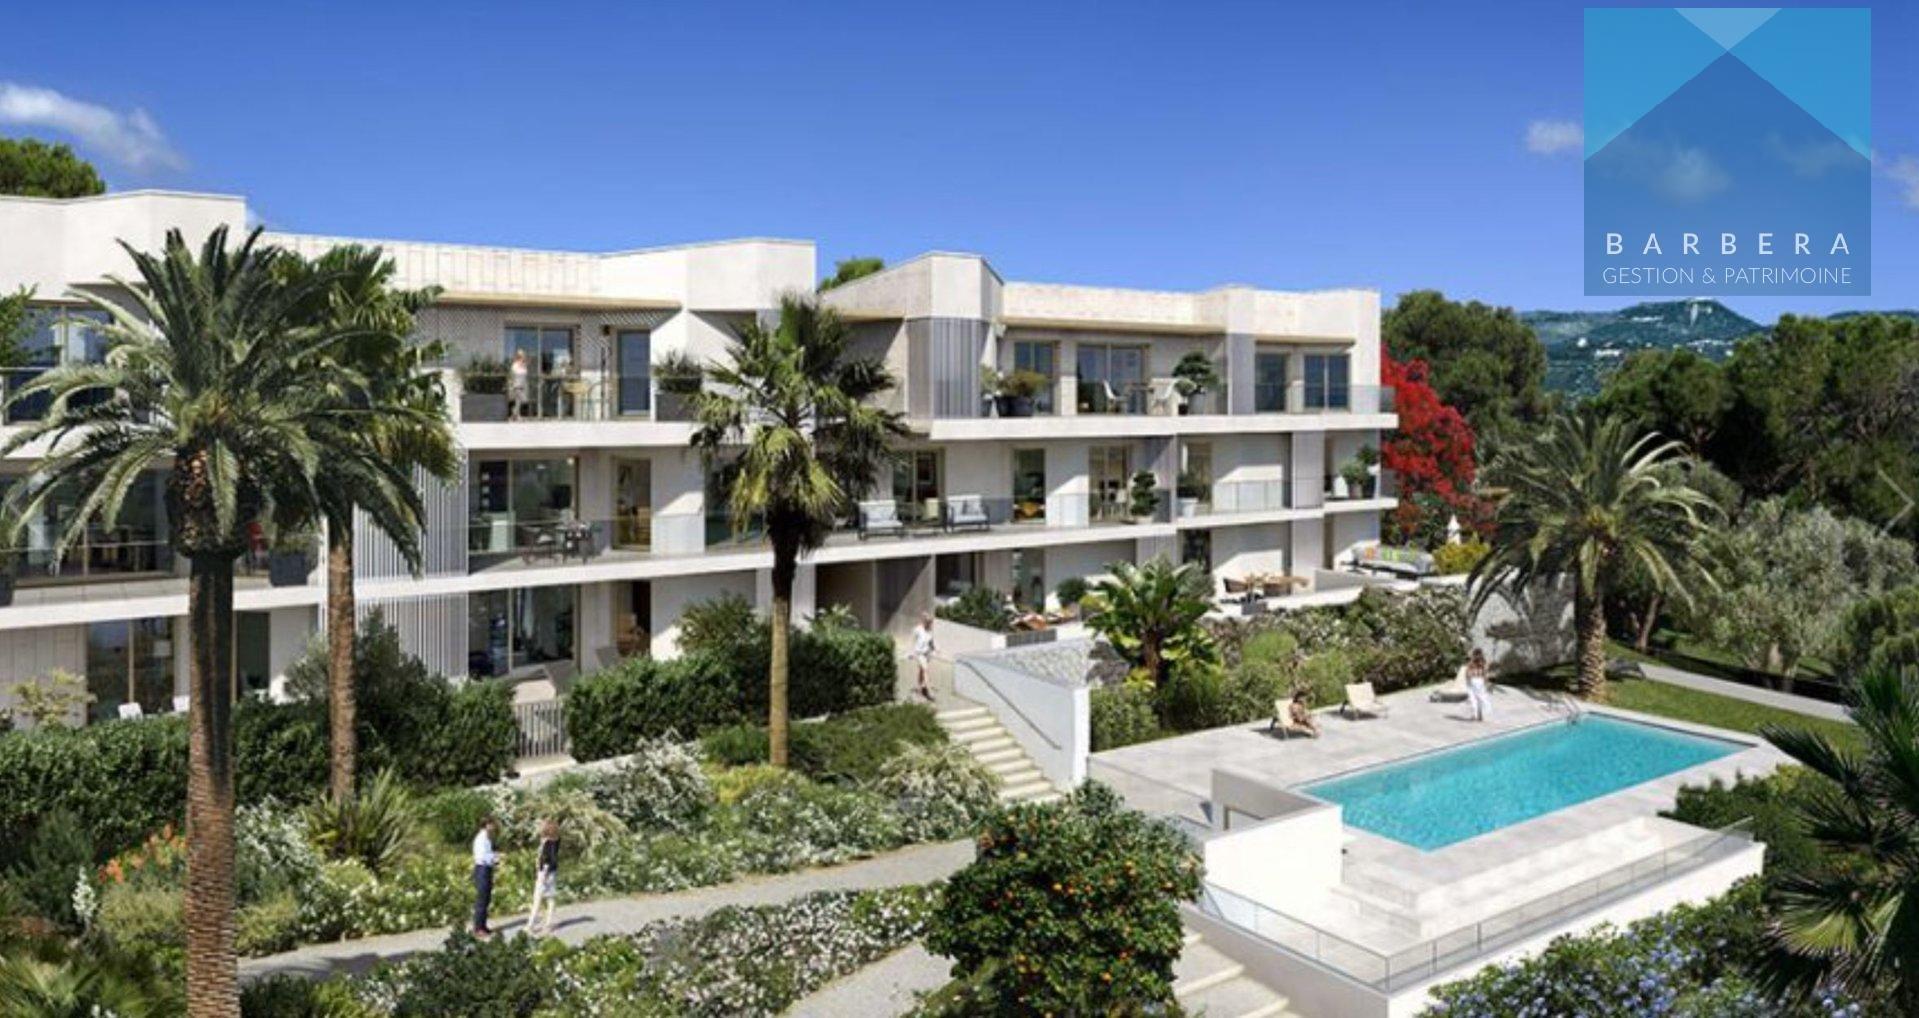 Programme appartement 70 m²